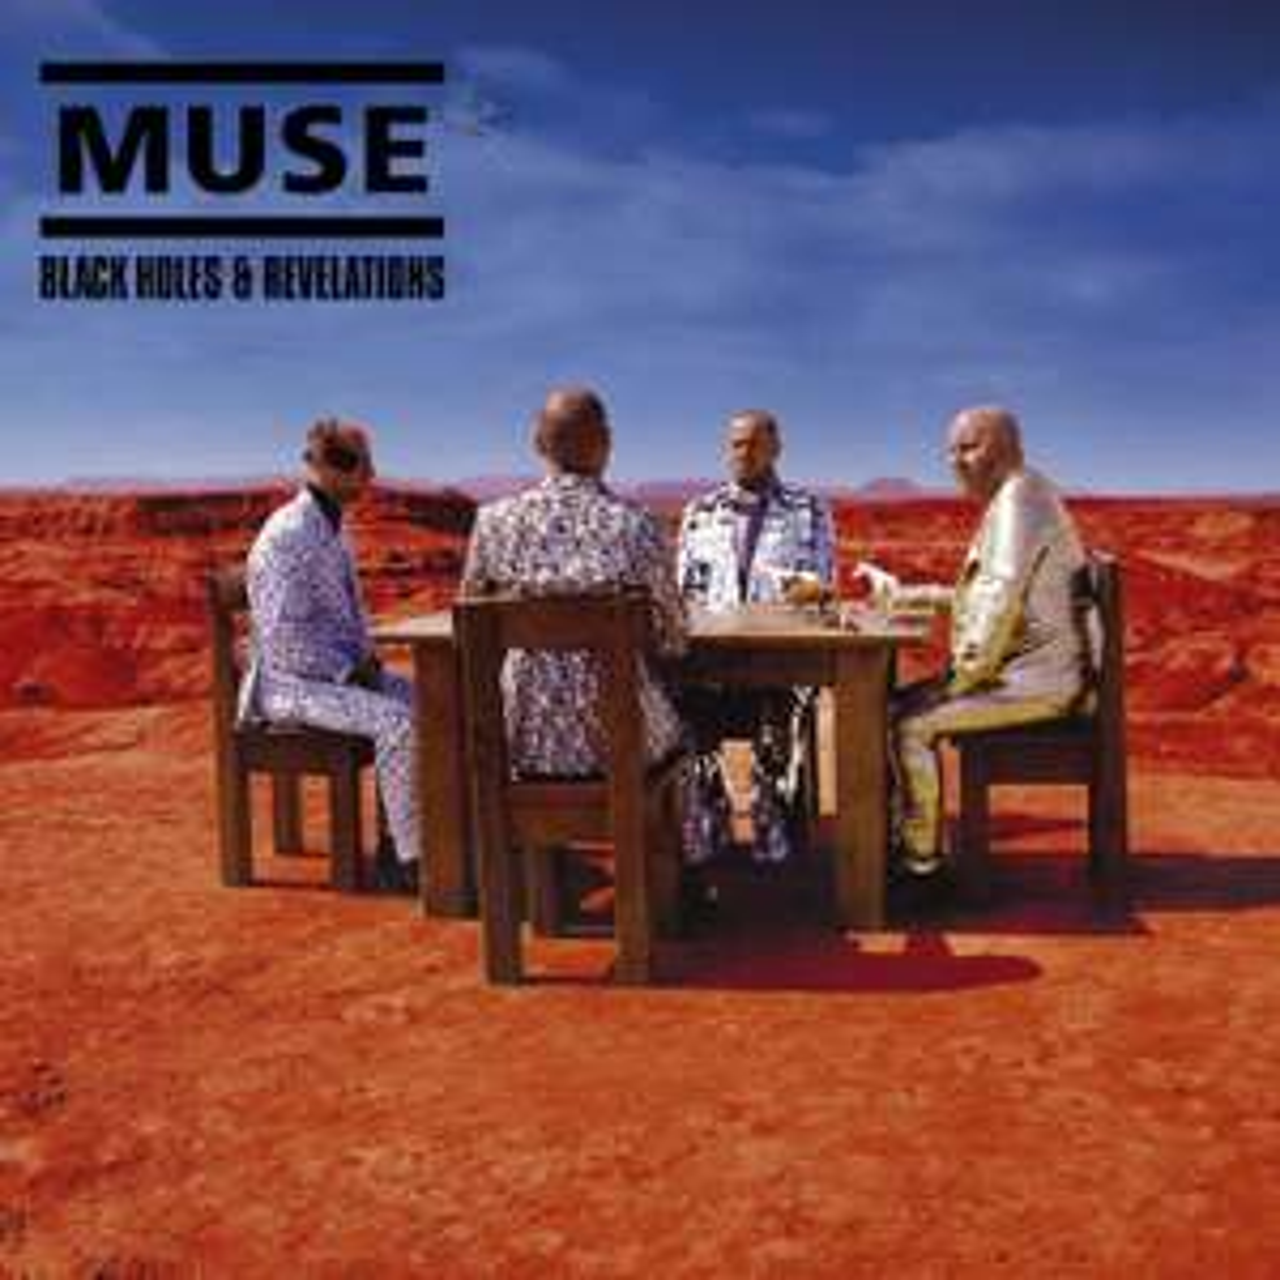 Muse - Black Holes & Revelations Vinyl £13.43 Amazon Prime / £16.42 Non Prime